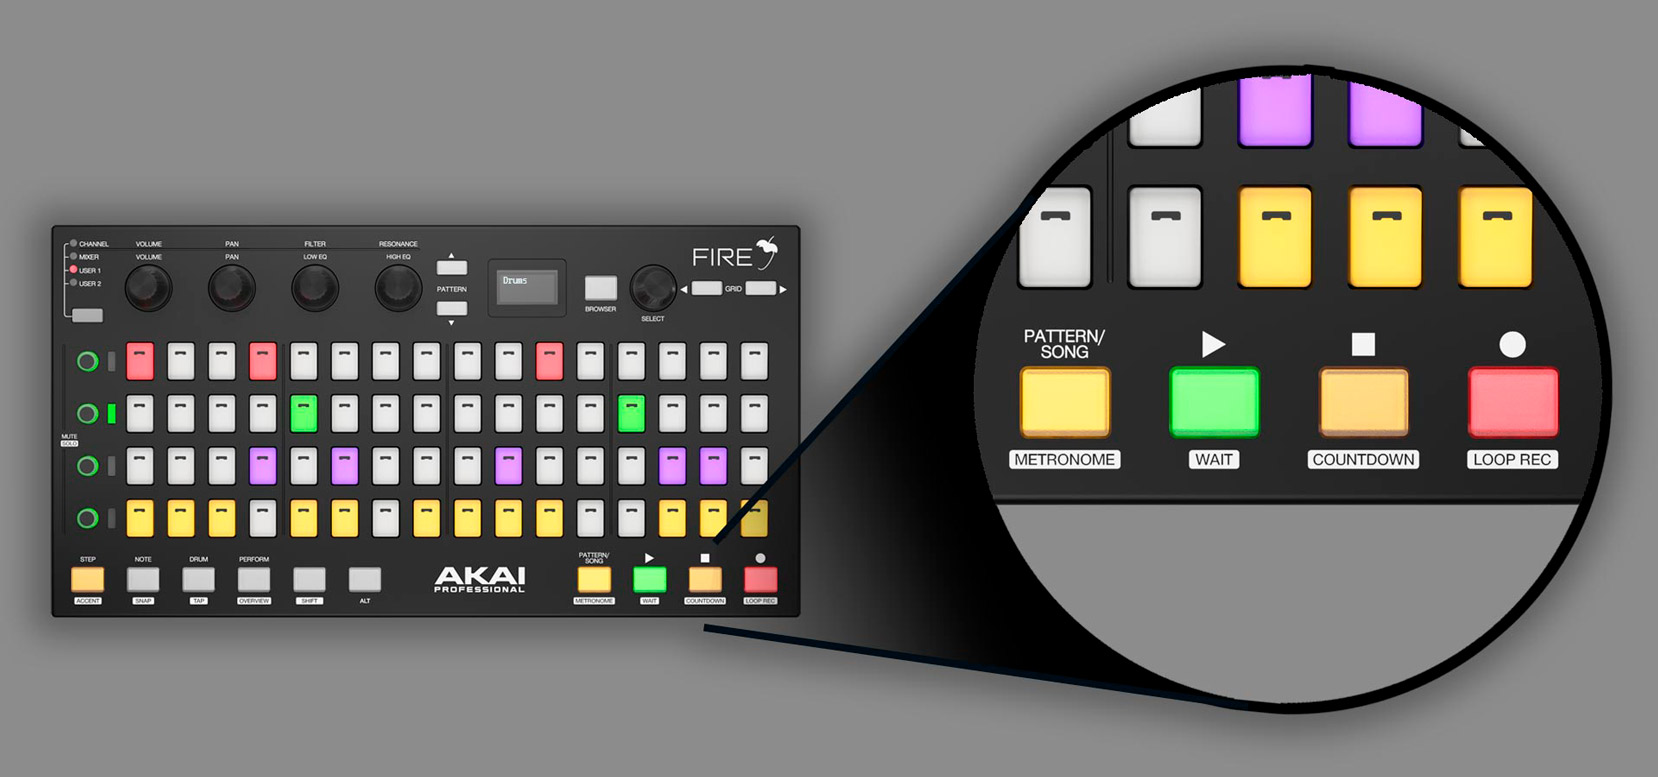 AKAI Fire Controladora Midi USB  - Audio Video & cia